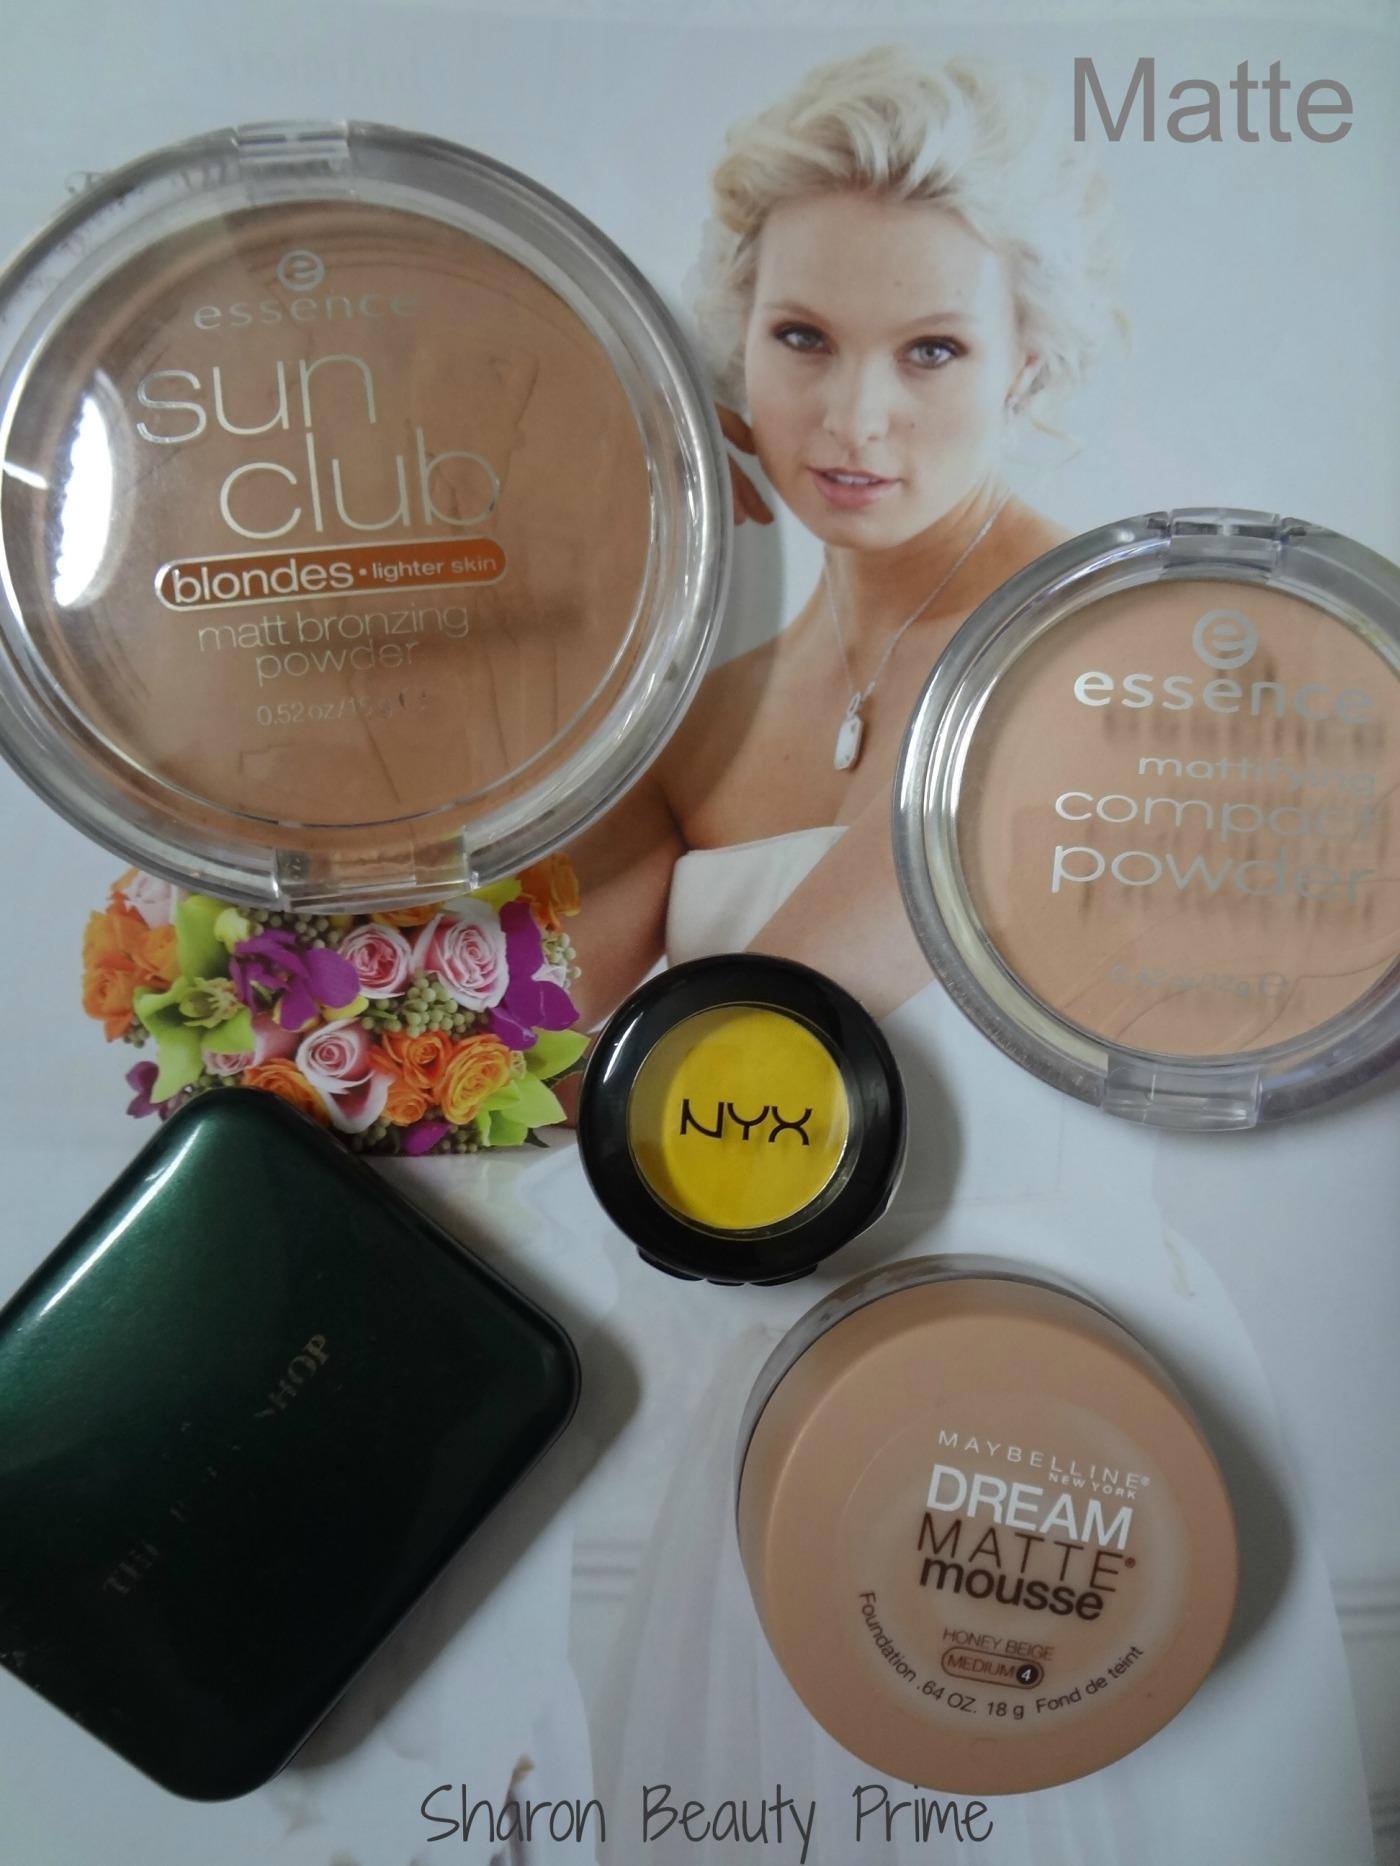 drugstore matte makeup